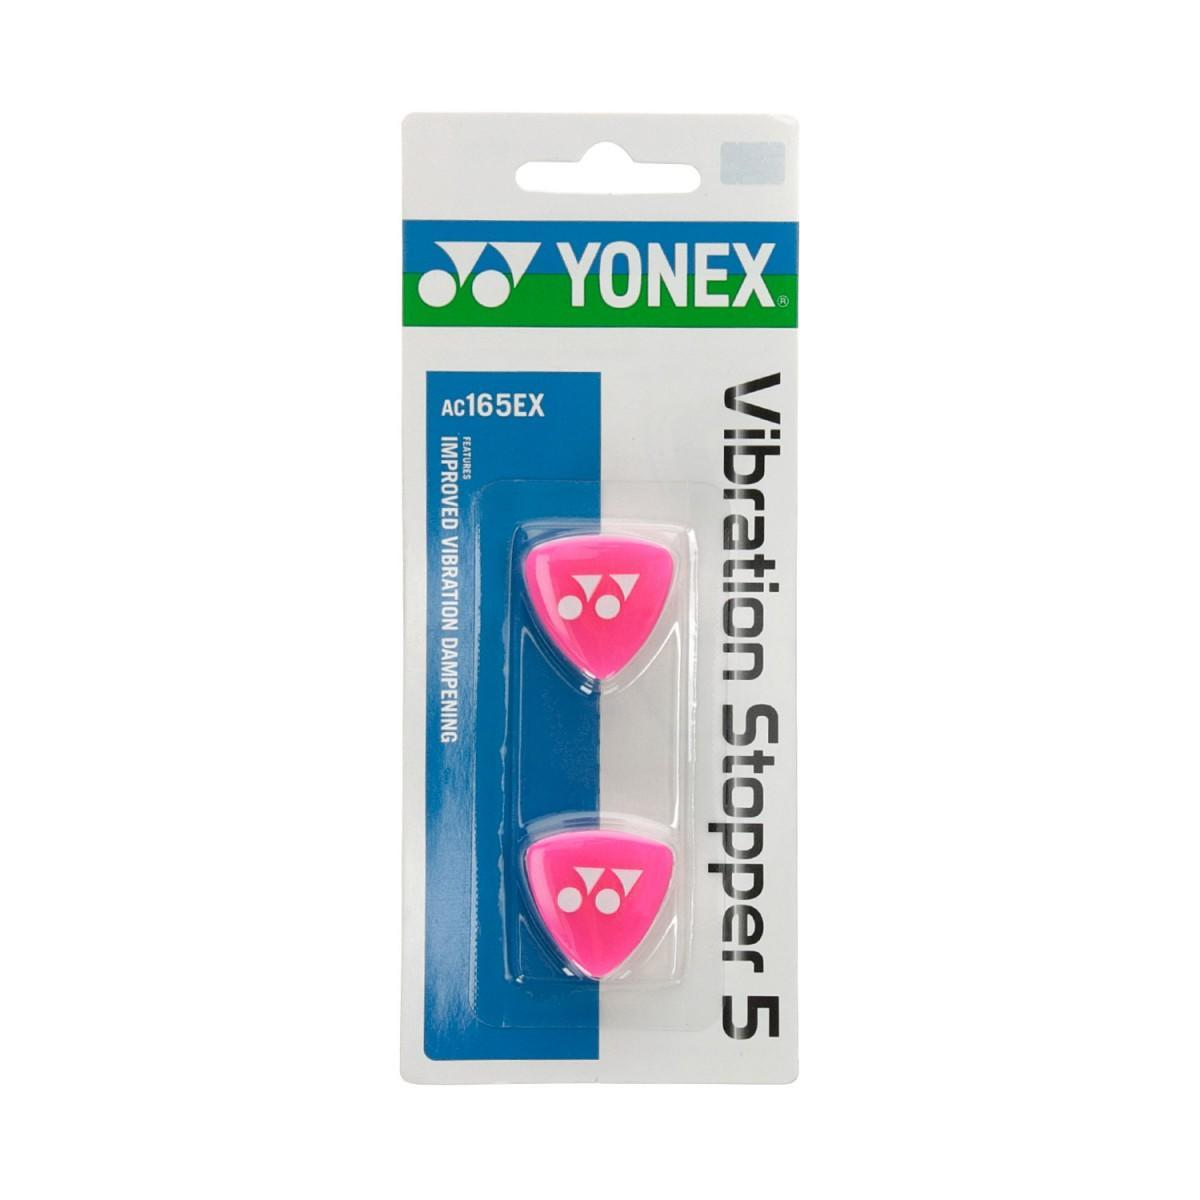 Виброгаситель Yonex Vibration Stopper 5 Pink